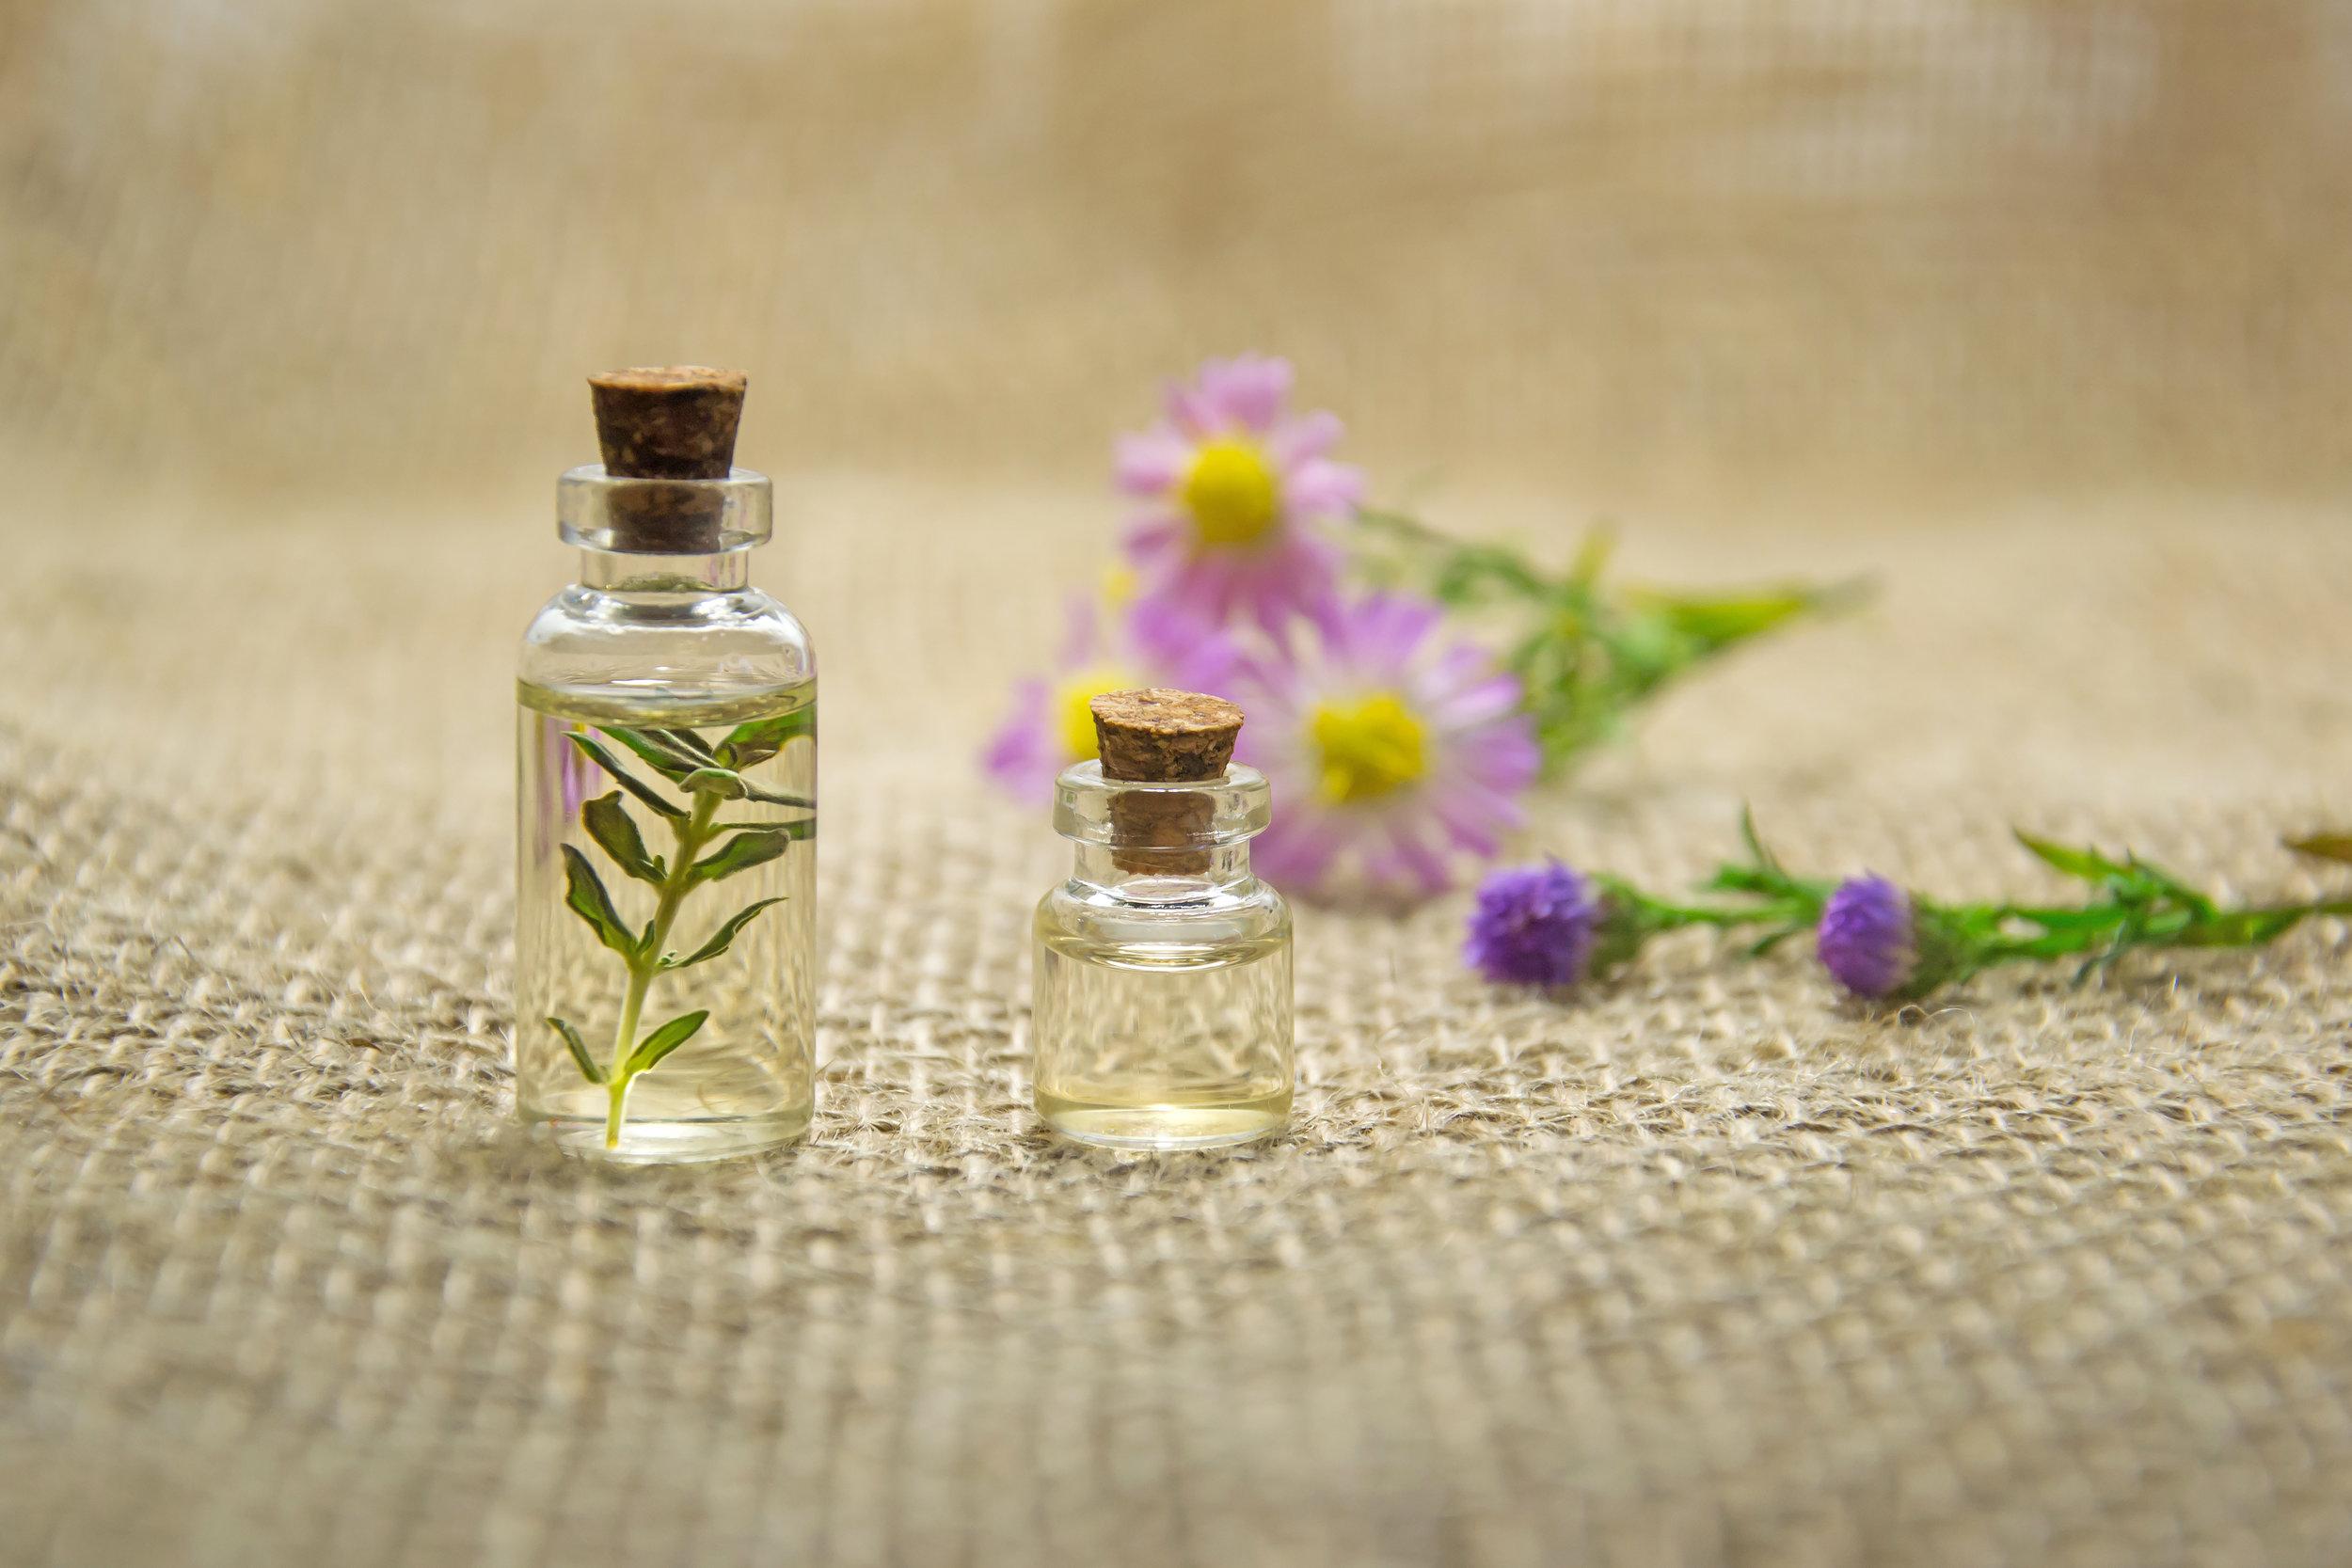 aromatherapy-cosmetic-oil-essential-oil-flowers-flower-alternative-1433657-pxhere.com (1).jpg